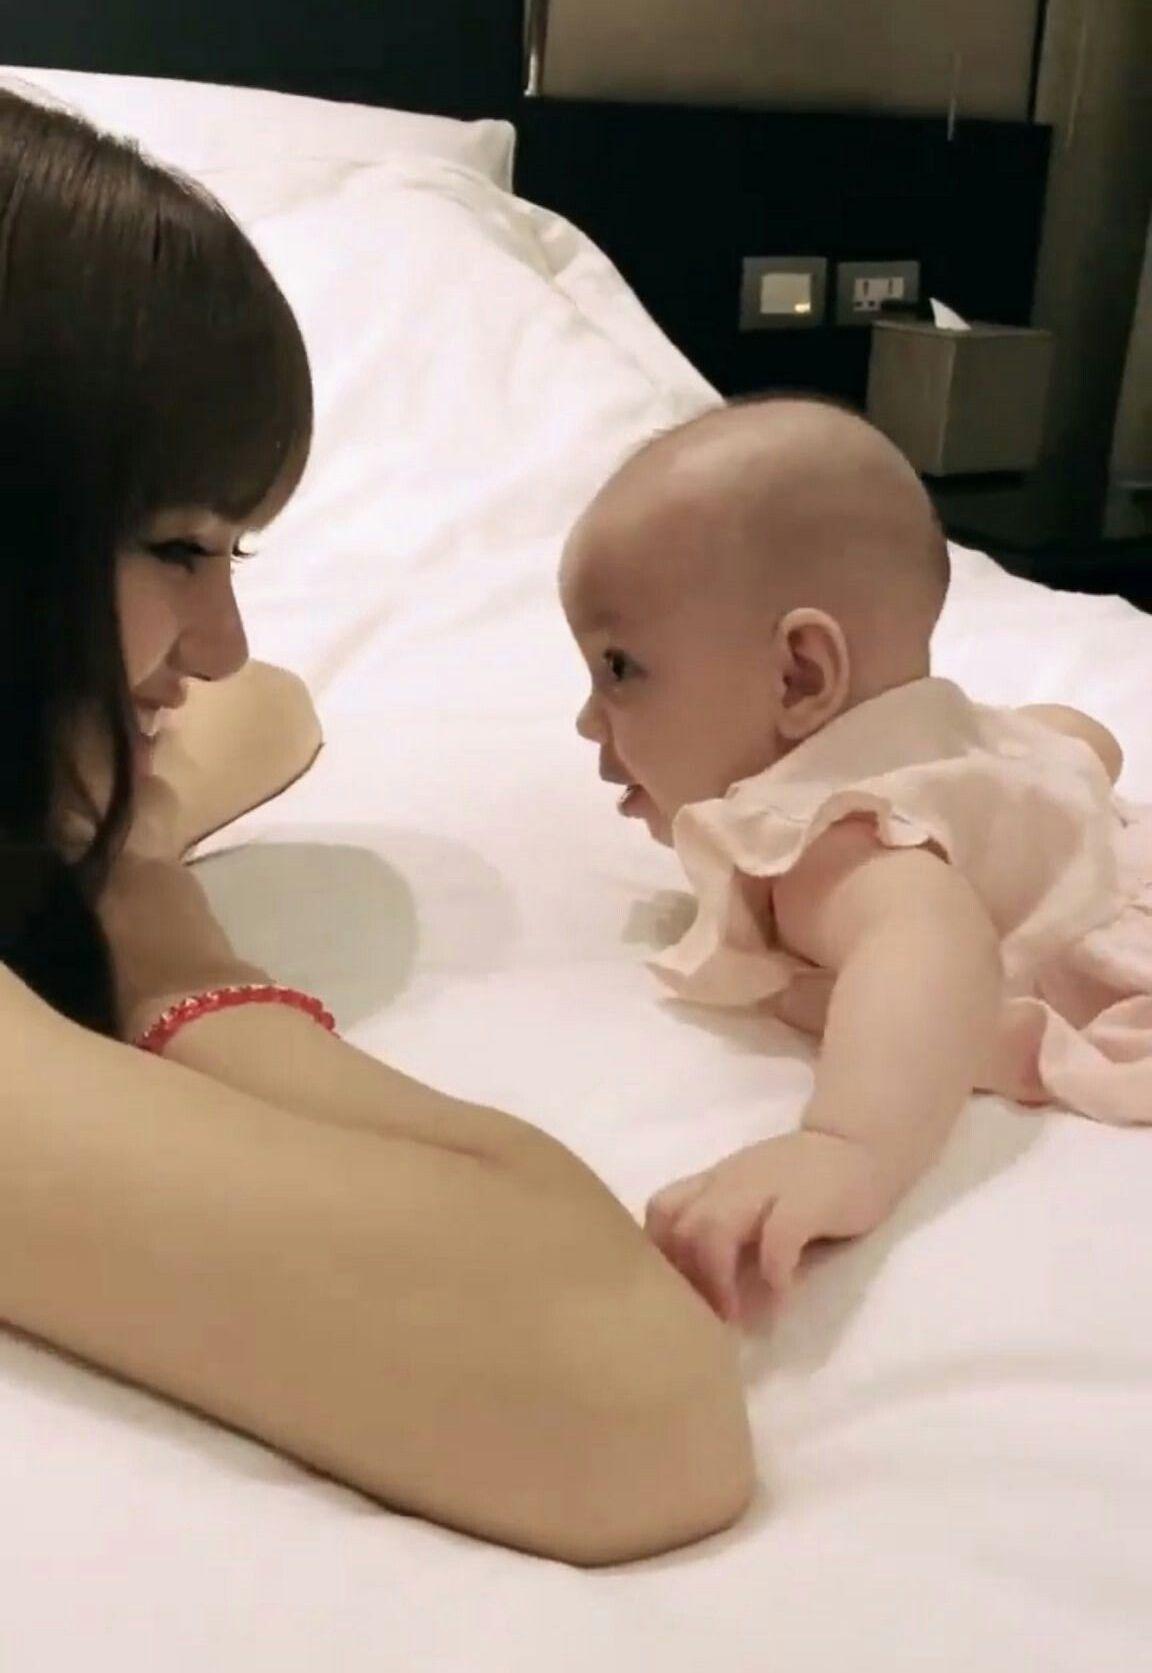 Lisa Blakpink saat bersama bayi kecil